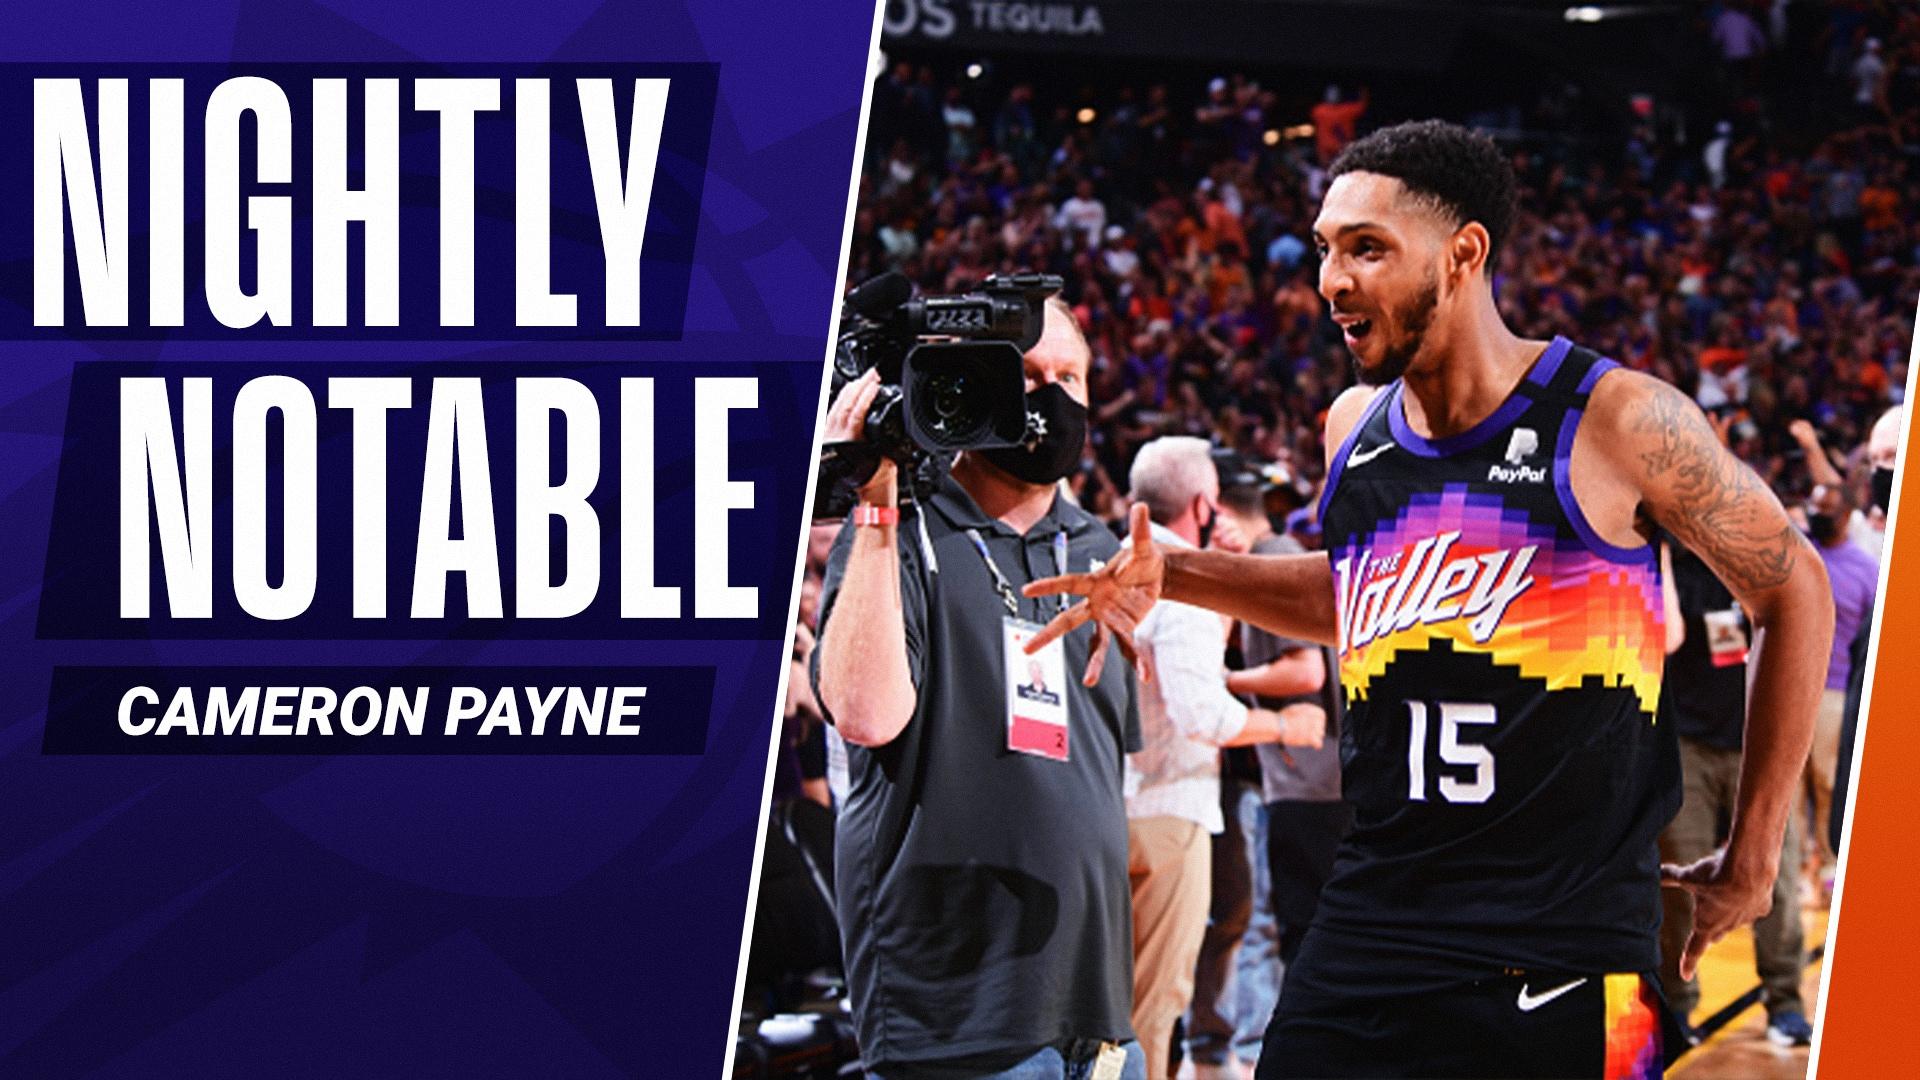 Nightly Notable: Cameron Payne | June 22